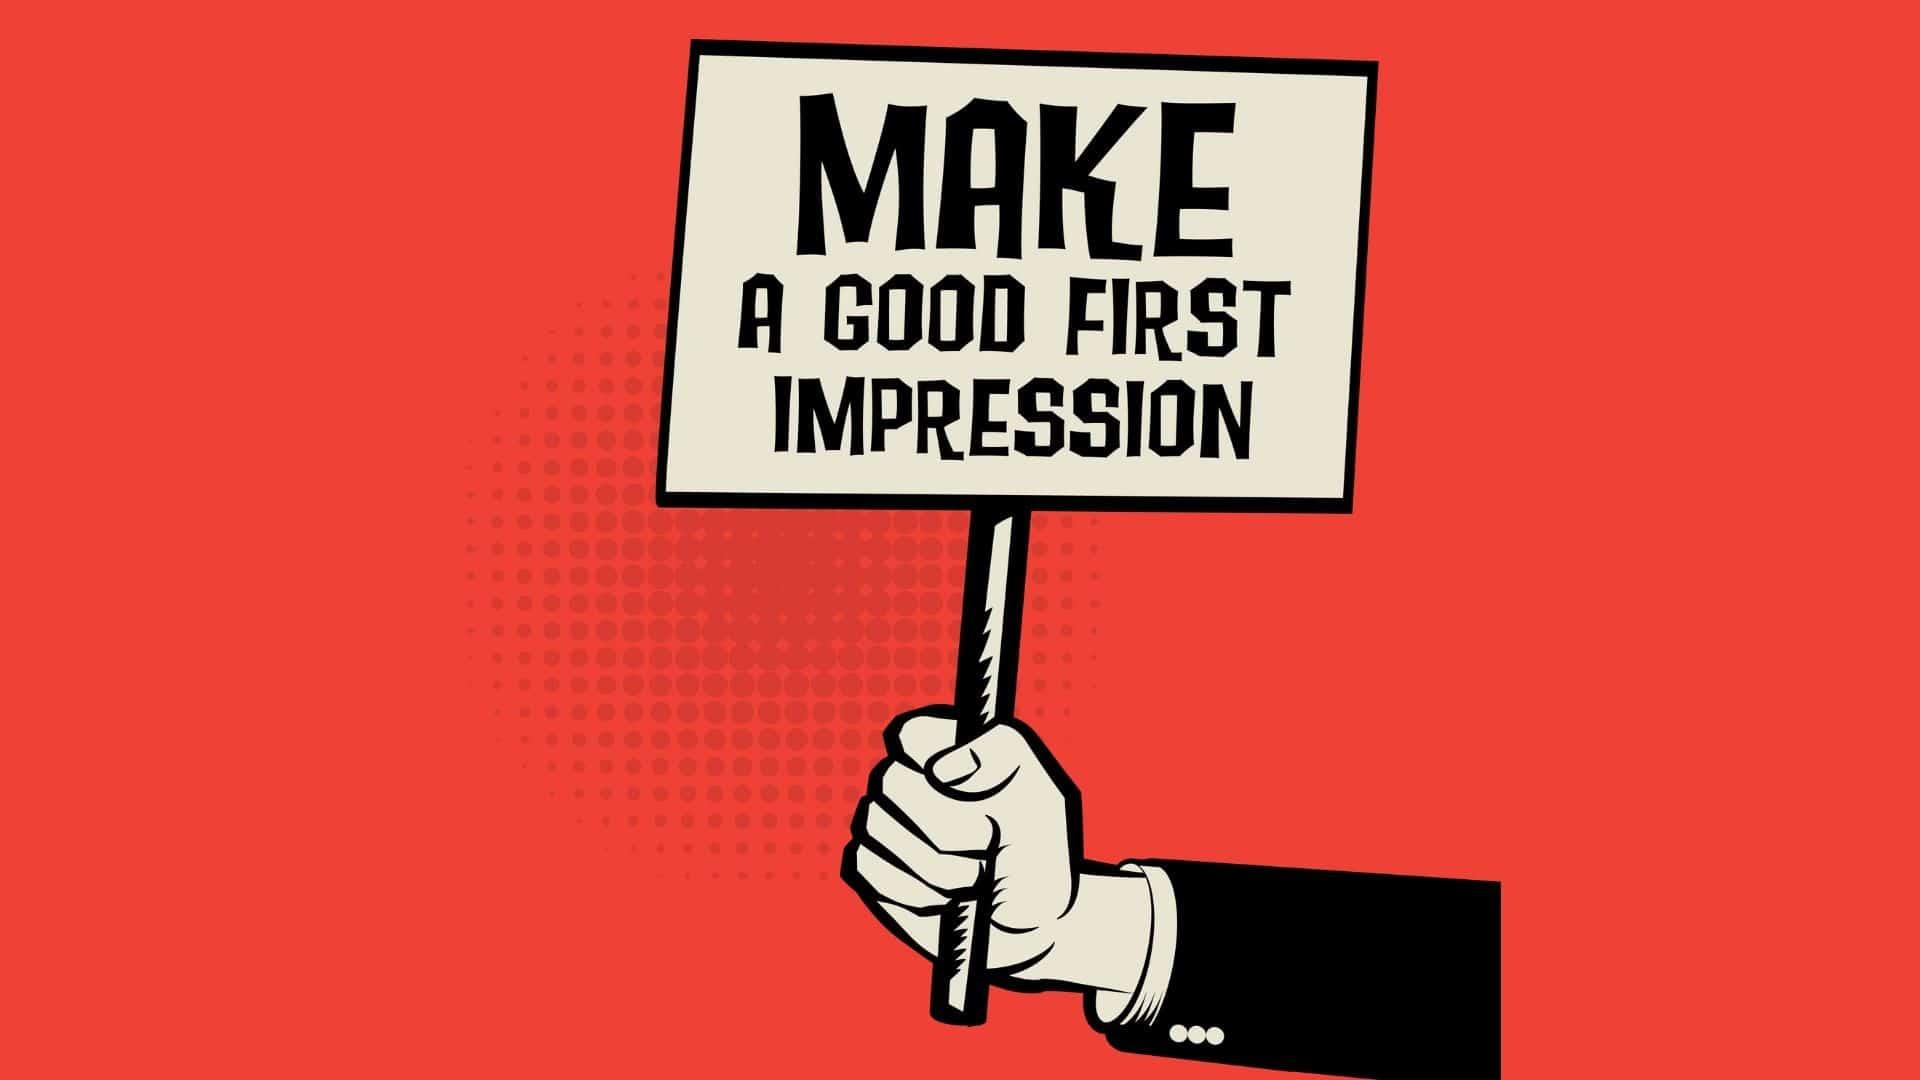 FIRST IMPRESSIONS STICK